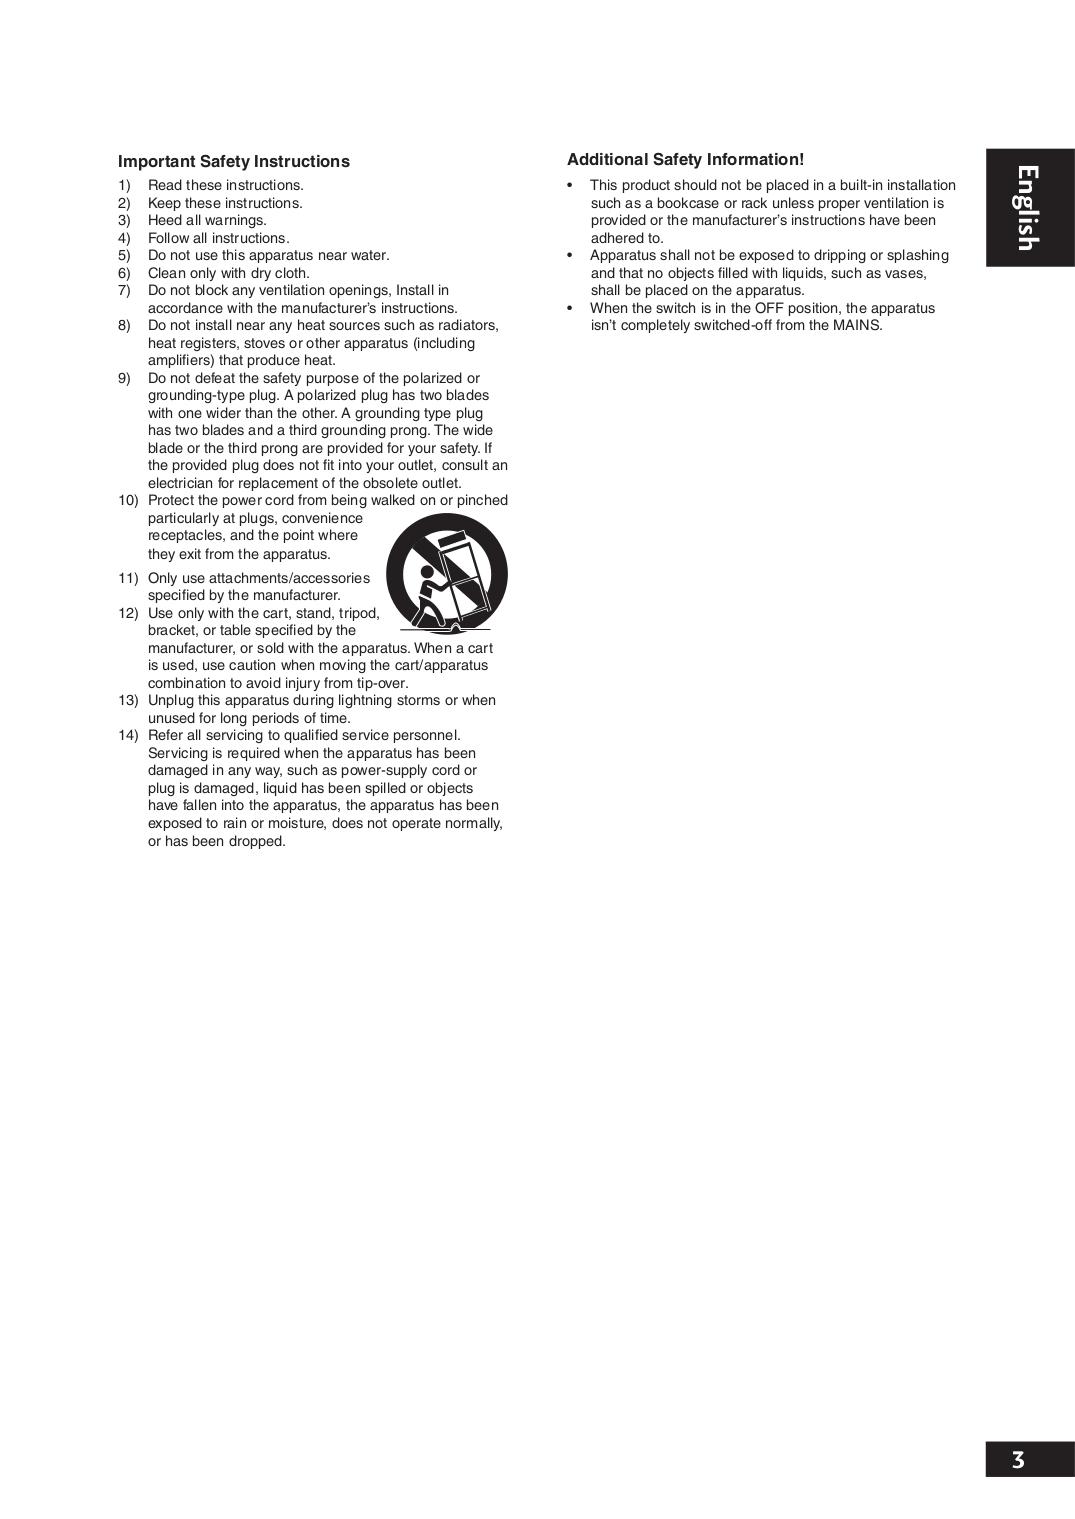 PDF manual for Marantz DVD Players DV7001